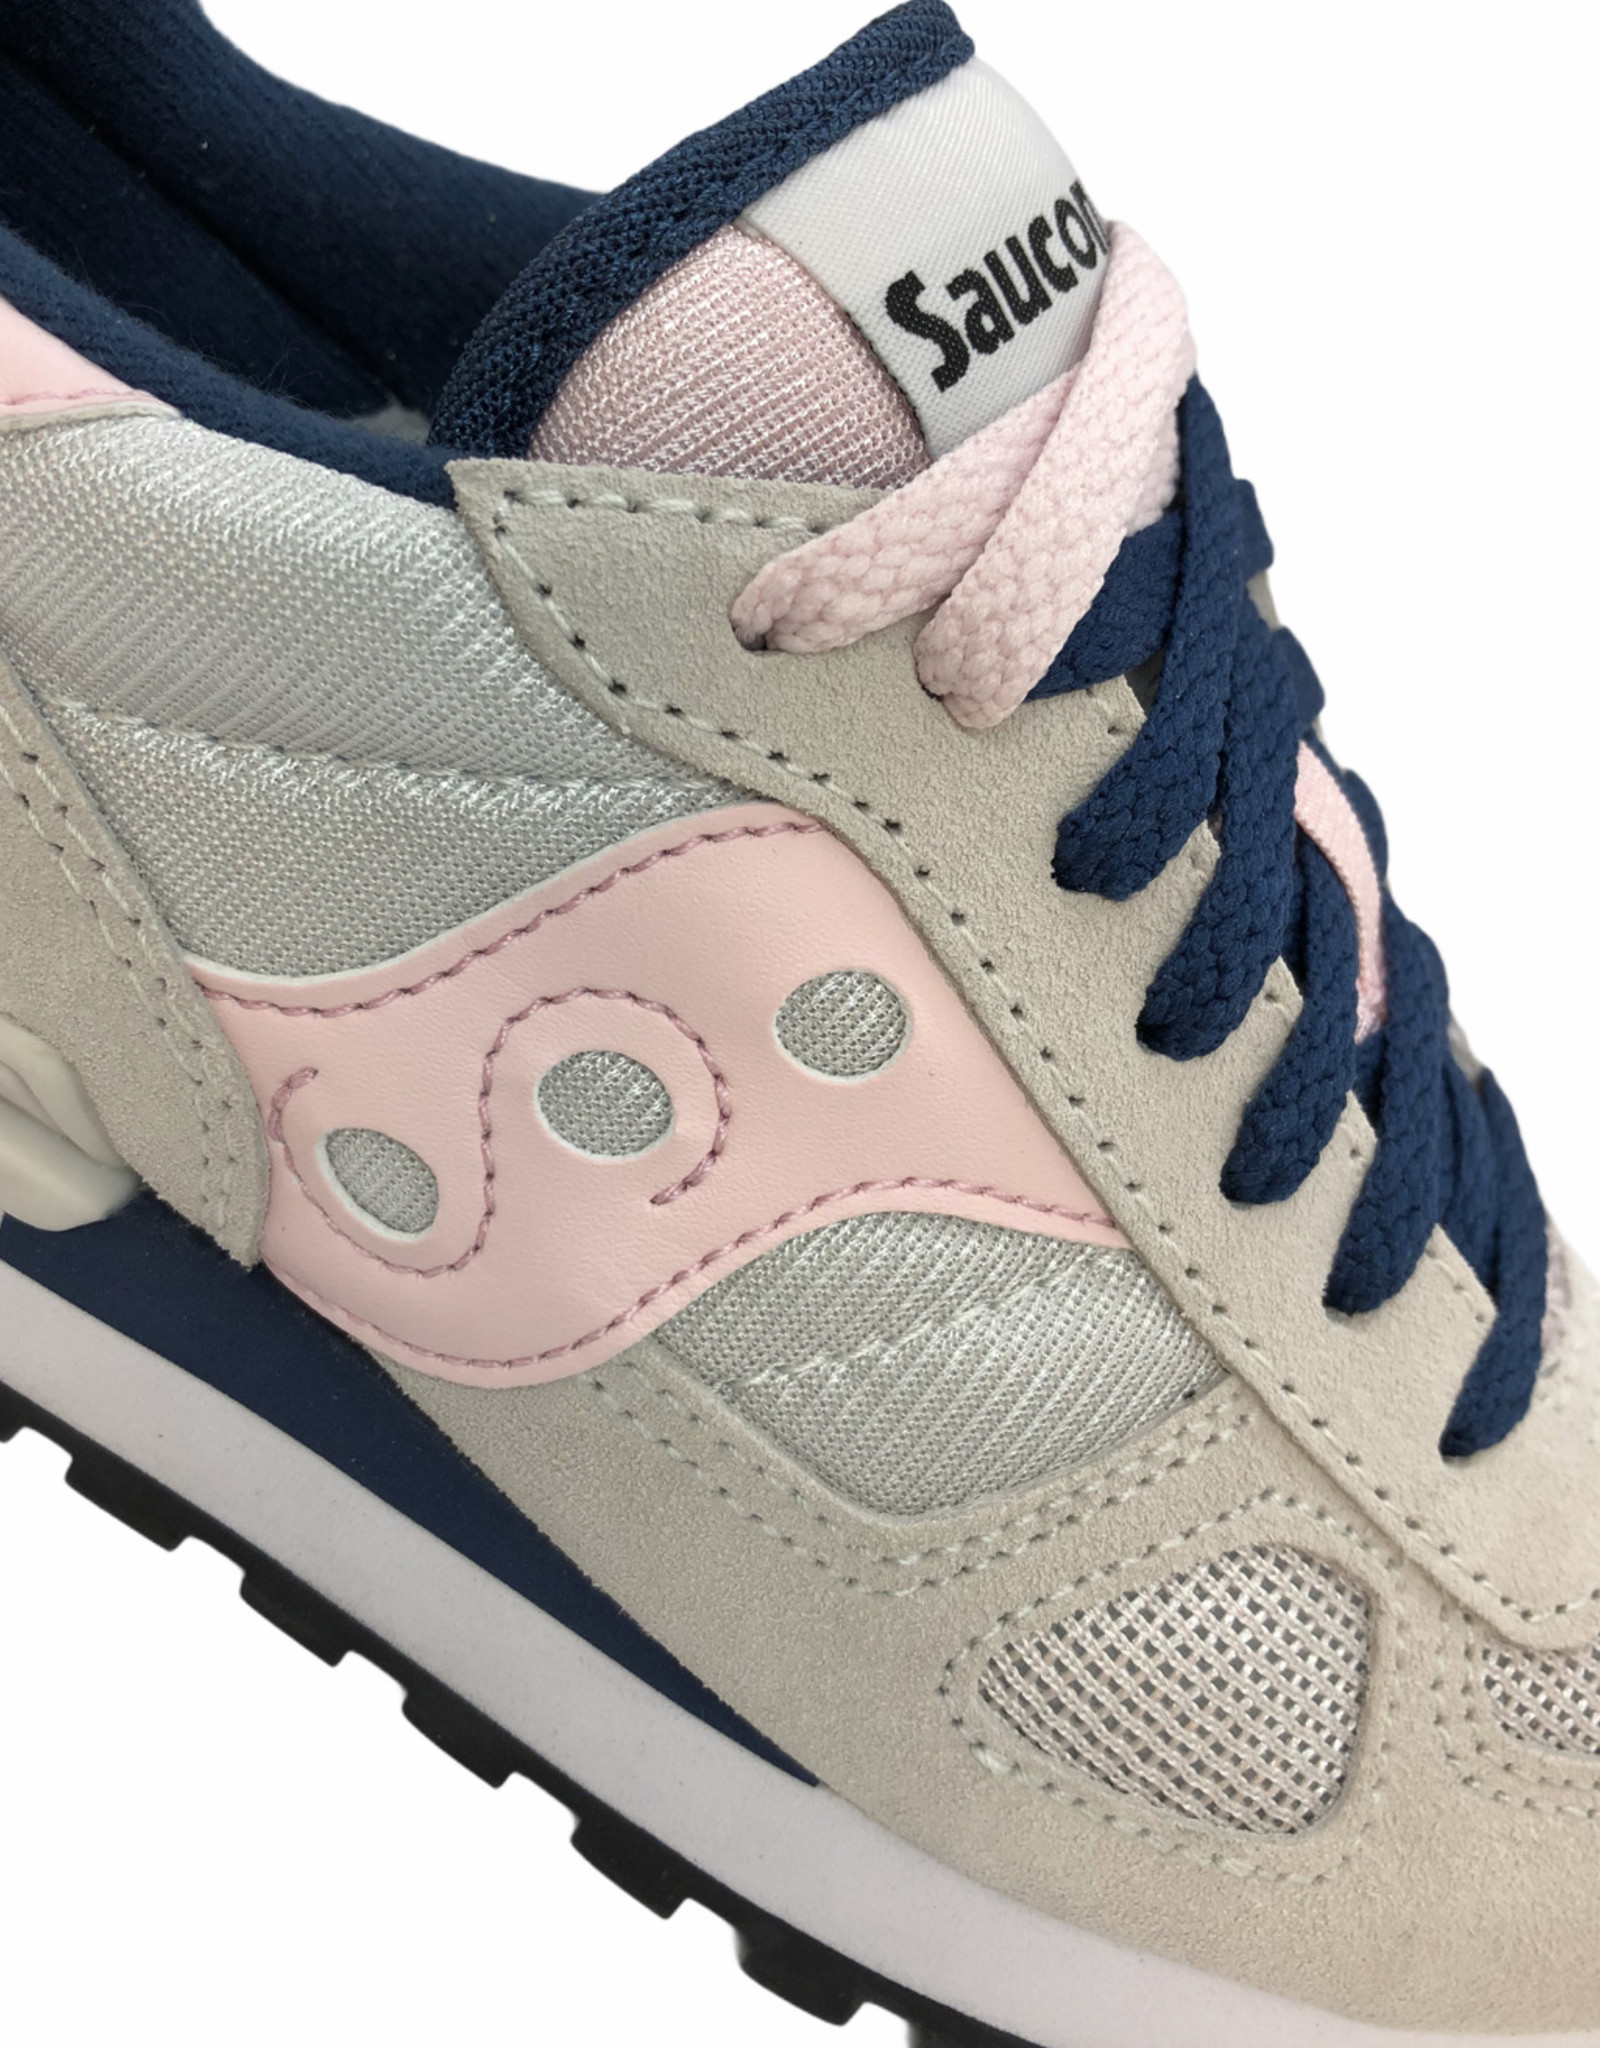 Saucony shadow original grey/pink/blue